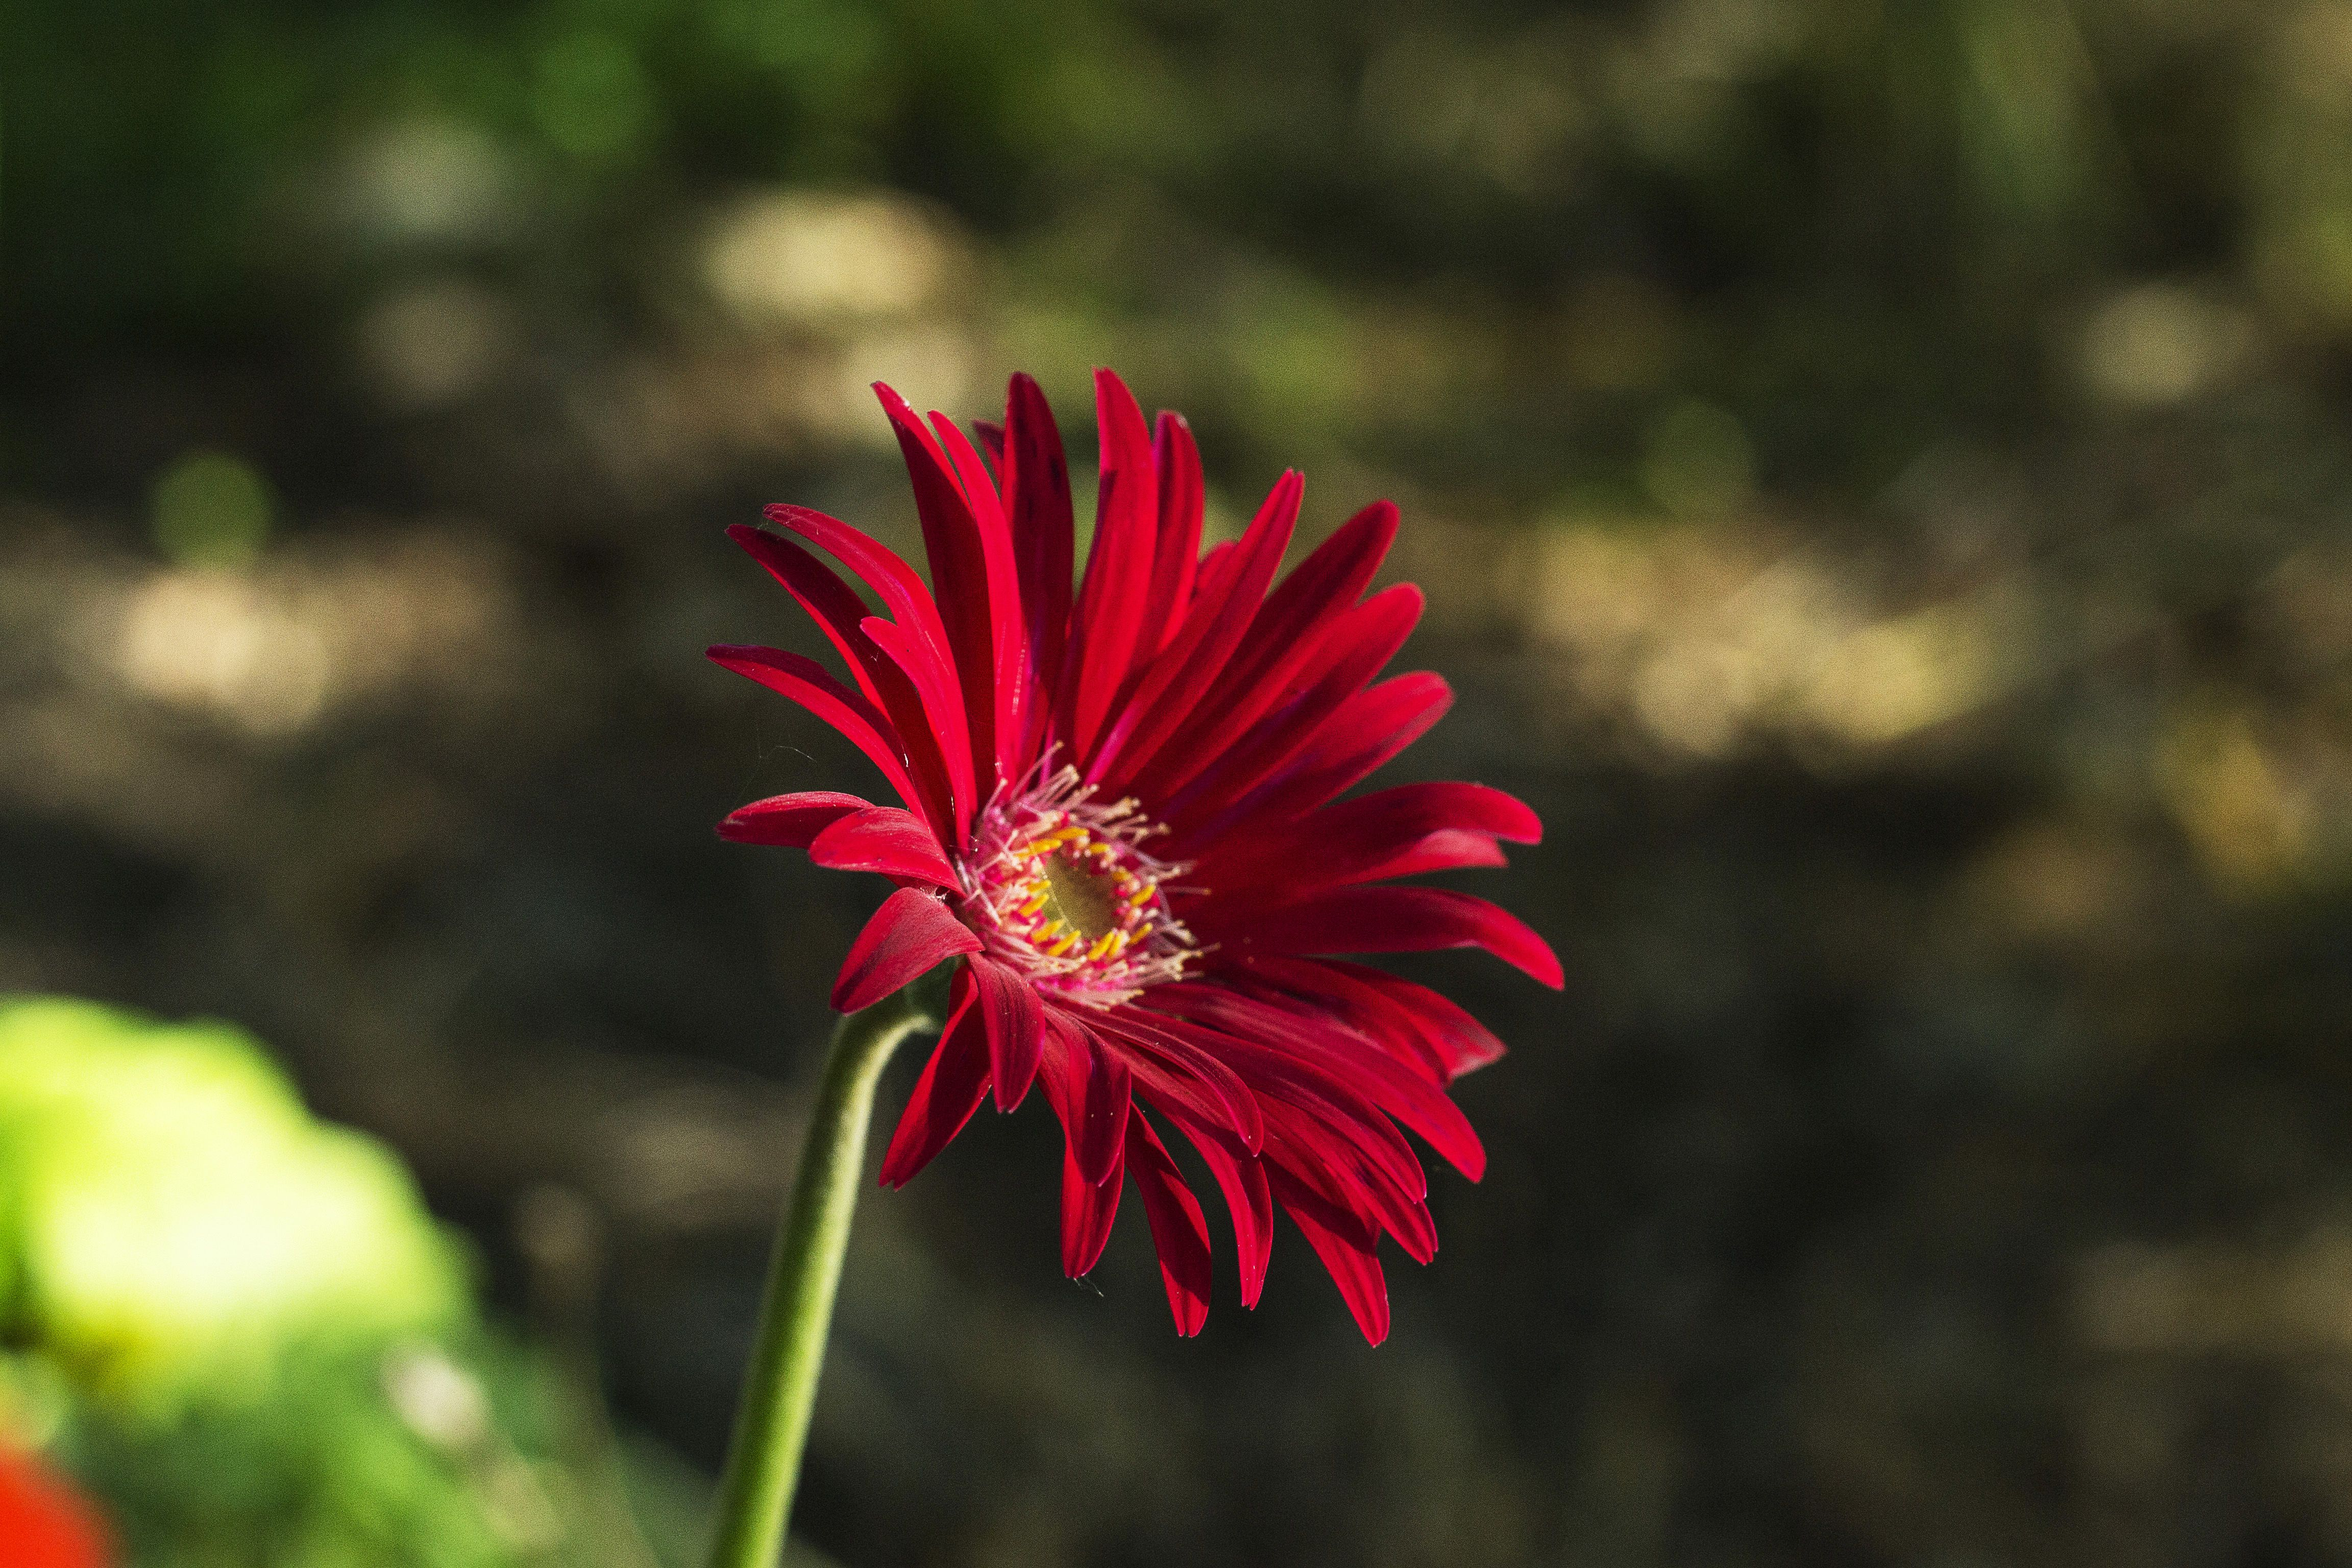 Red Aster Flowers Aster Flower Tattoos Aster Flower Flower Tattoo